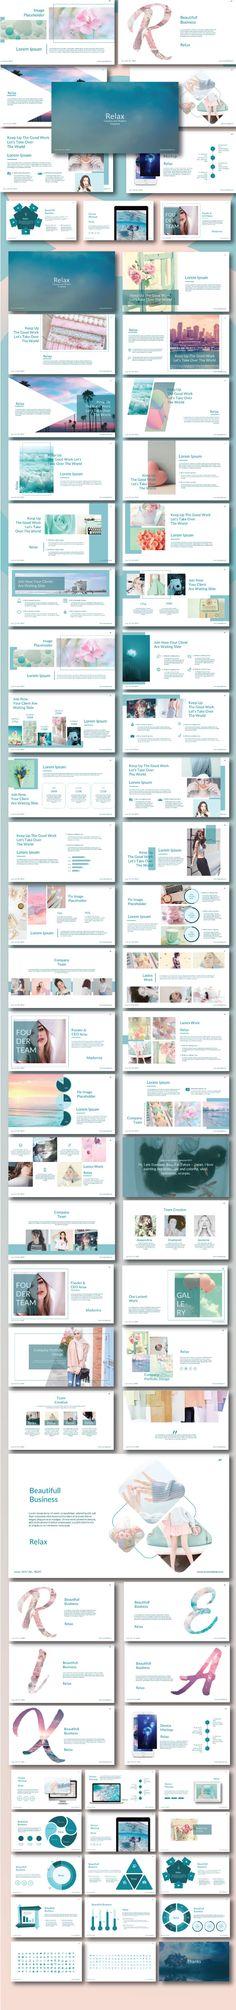 Relax - Creative Modern Template - Business PowerPoint Templates